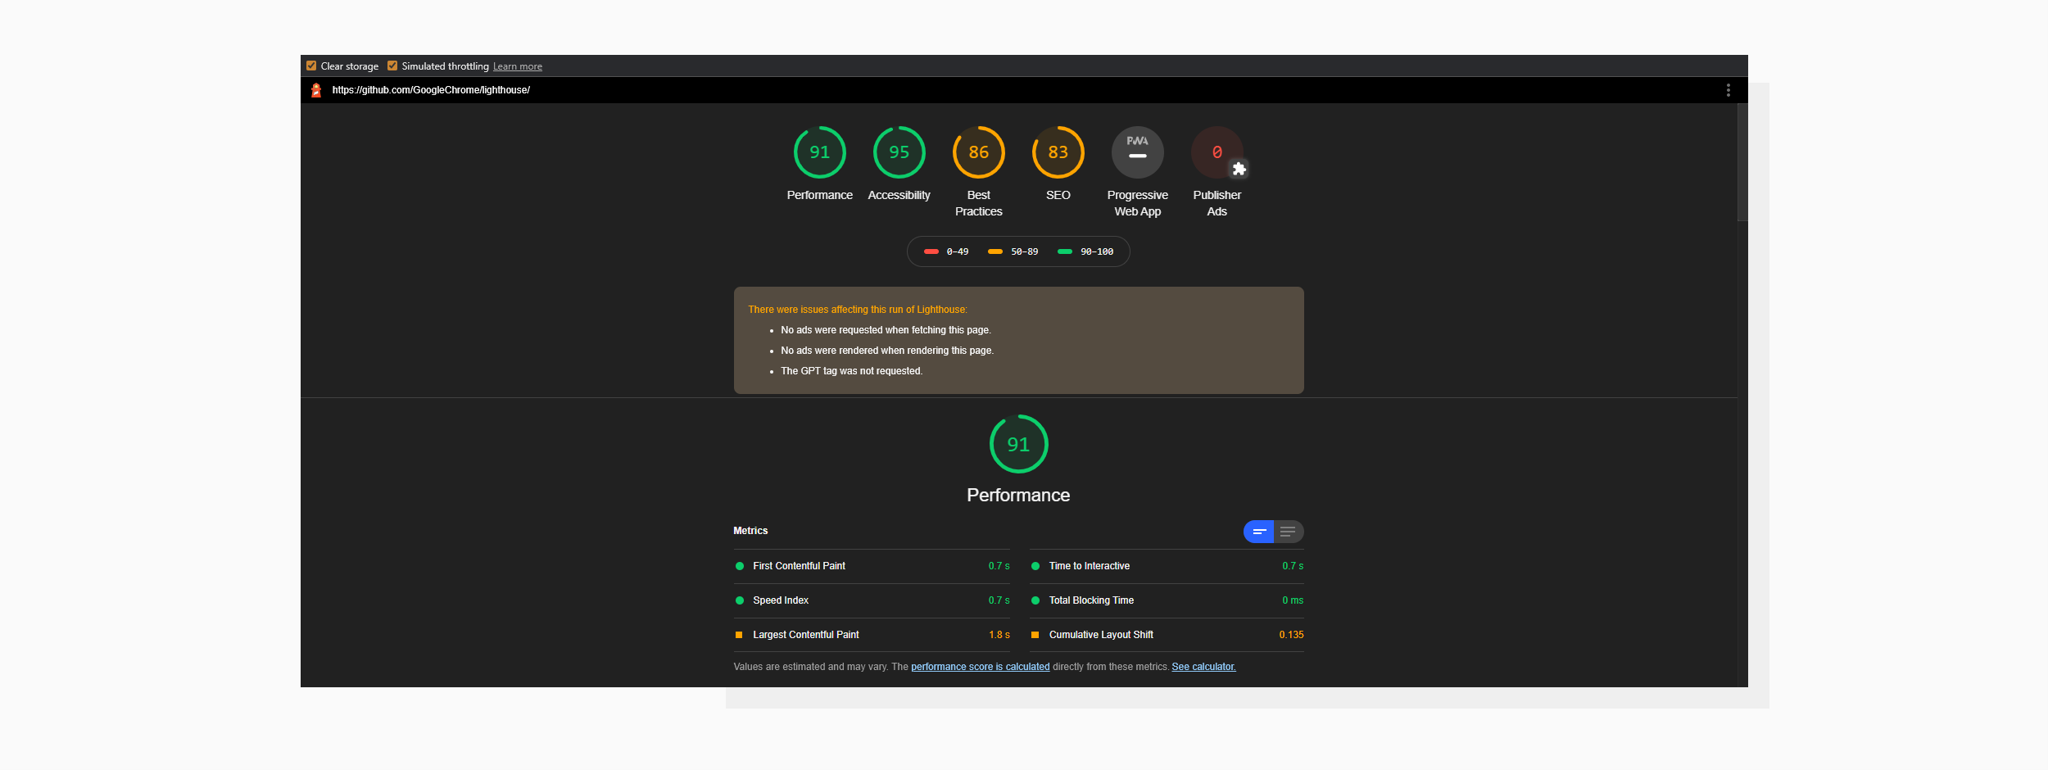 Google Lighthouse Report in Google Chrome